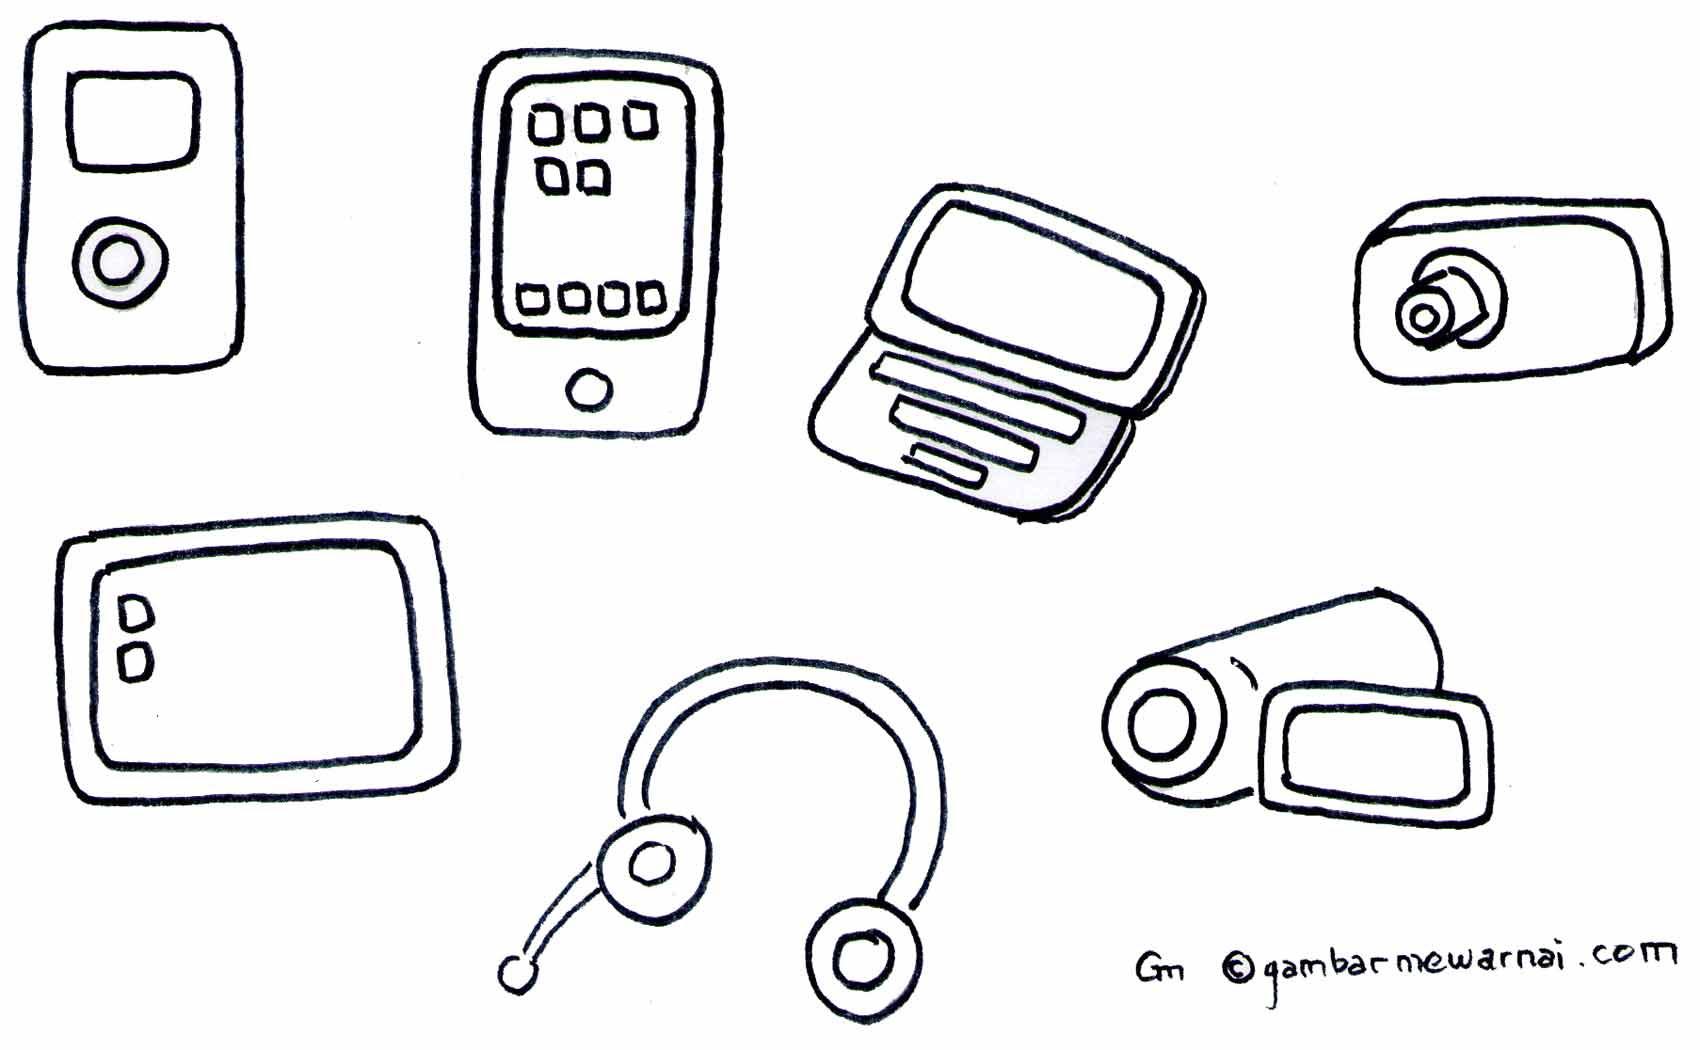 [Siap Cetak] Mewarnai Gambar Alat Komunikasi Telepon